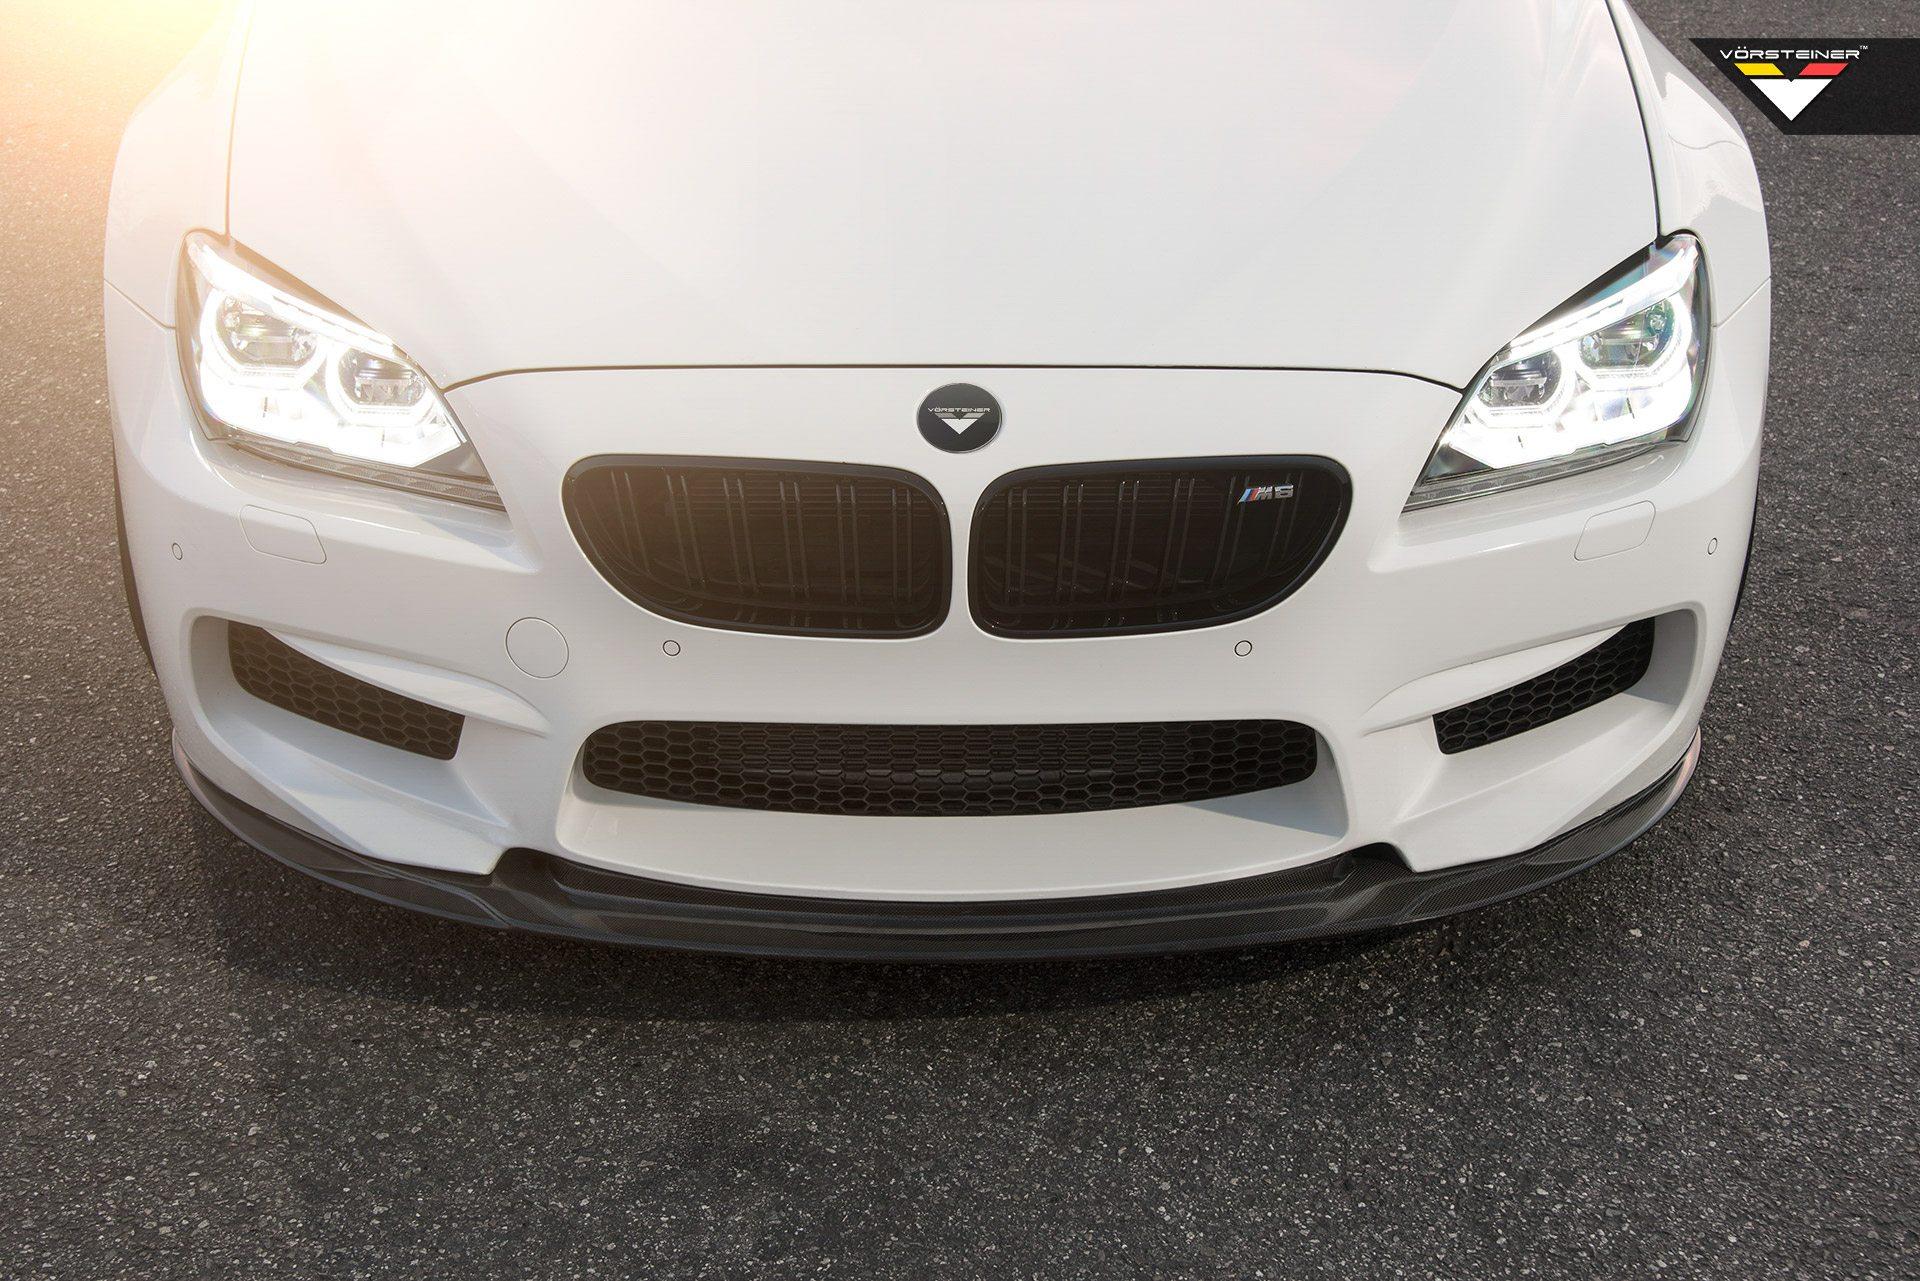 Vrs Aero Front Add On Spoiler Carbon Fiber Pp 1x1 Glossy Bmw F30 3